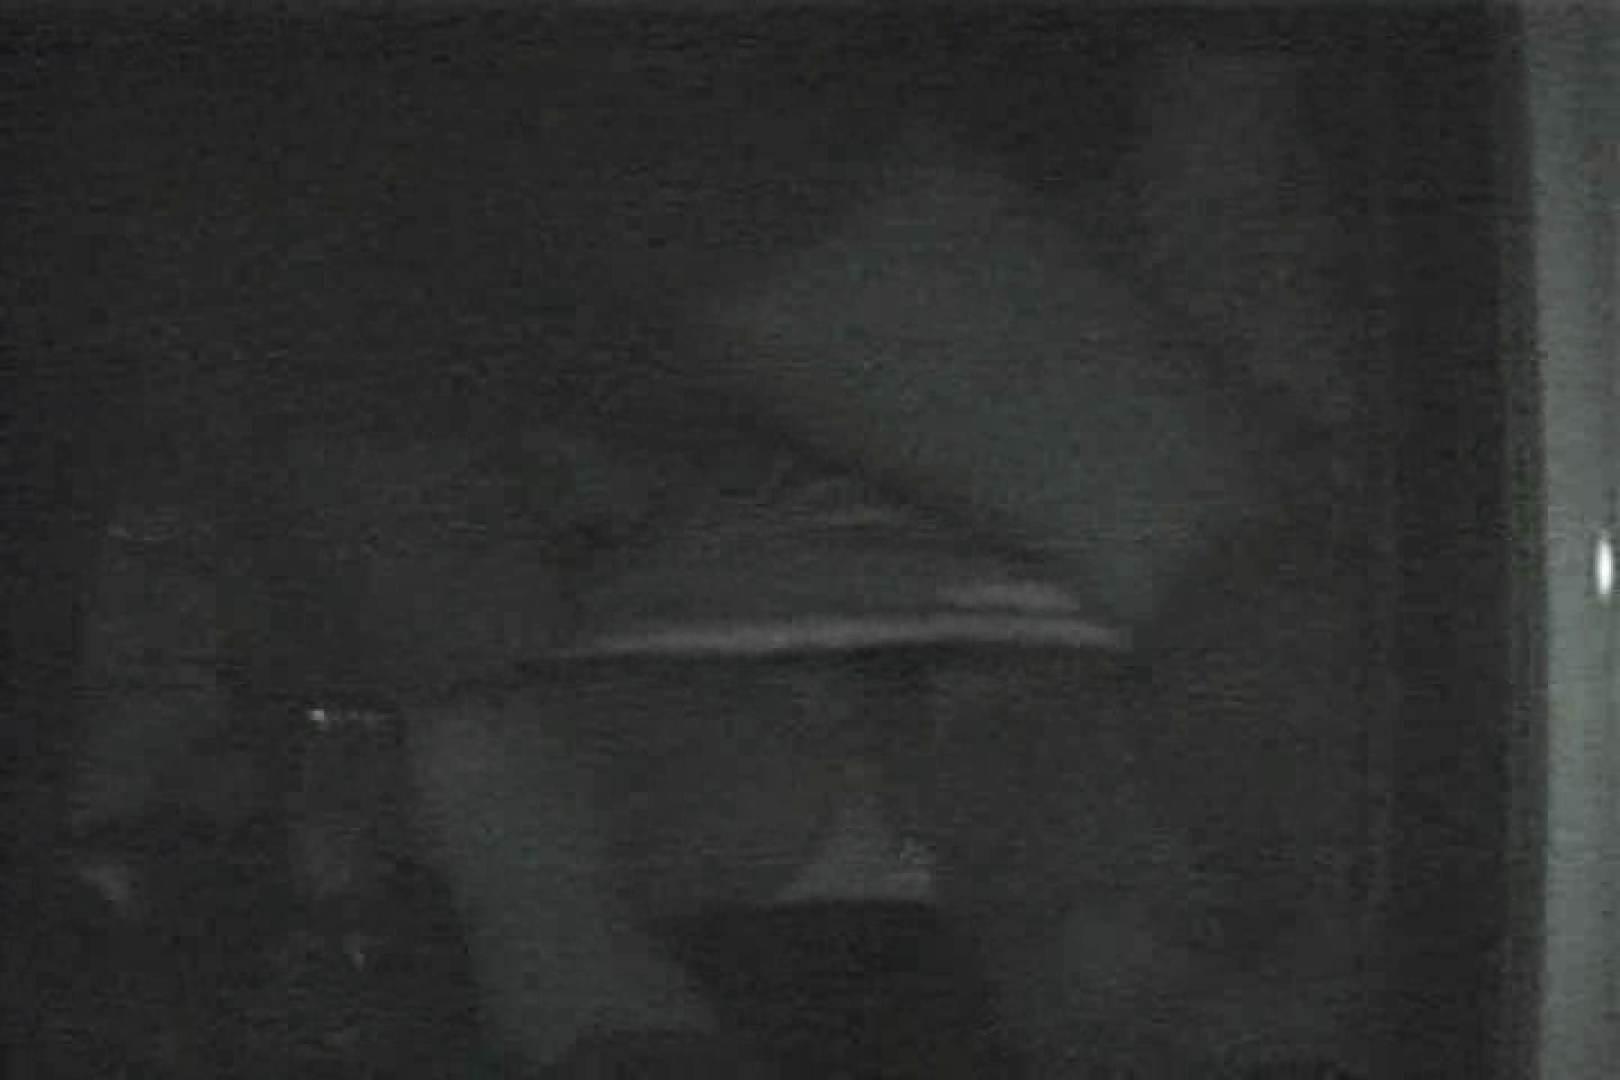 MASAさんの待ち伏せ撮り! 赤外線カーセックスVol.9 カップル セックス画像 74pic 28